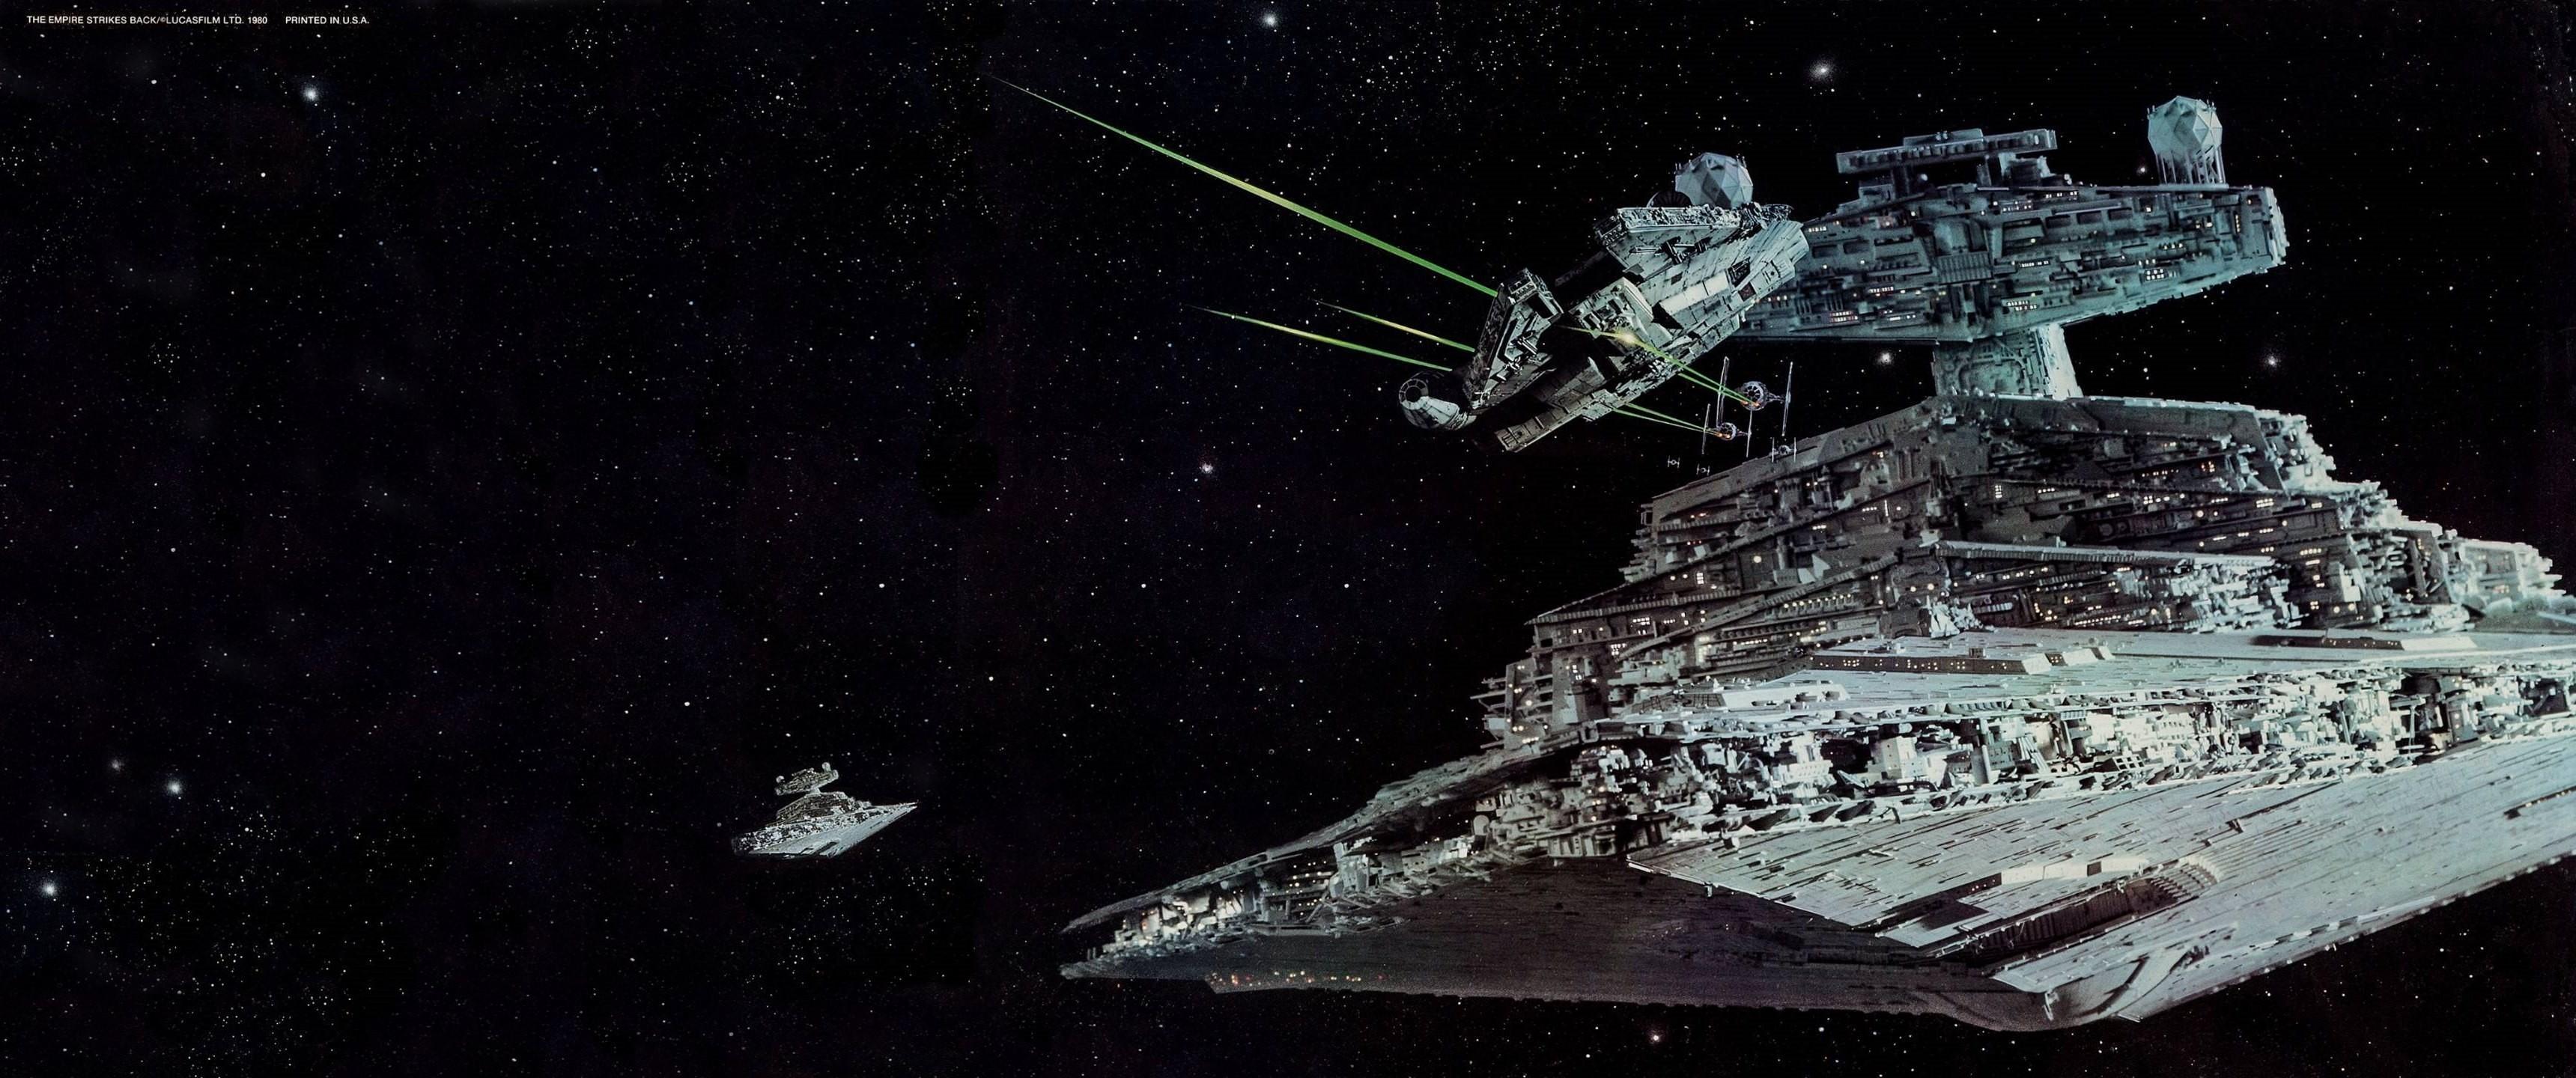 Star Wars Ultrawide Wallpaper: 3440 X 1440 Wallpaper (66+ Images